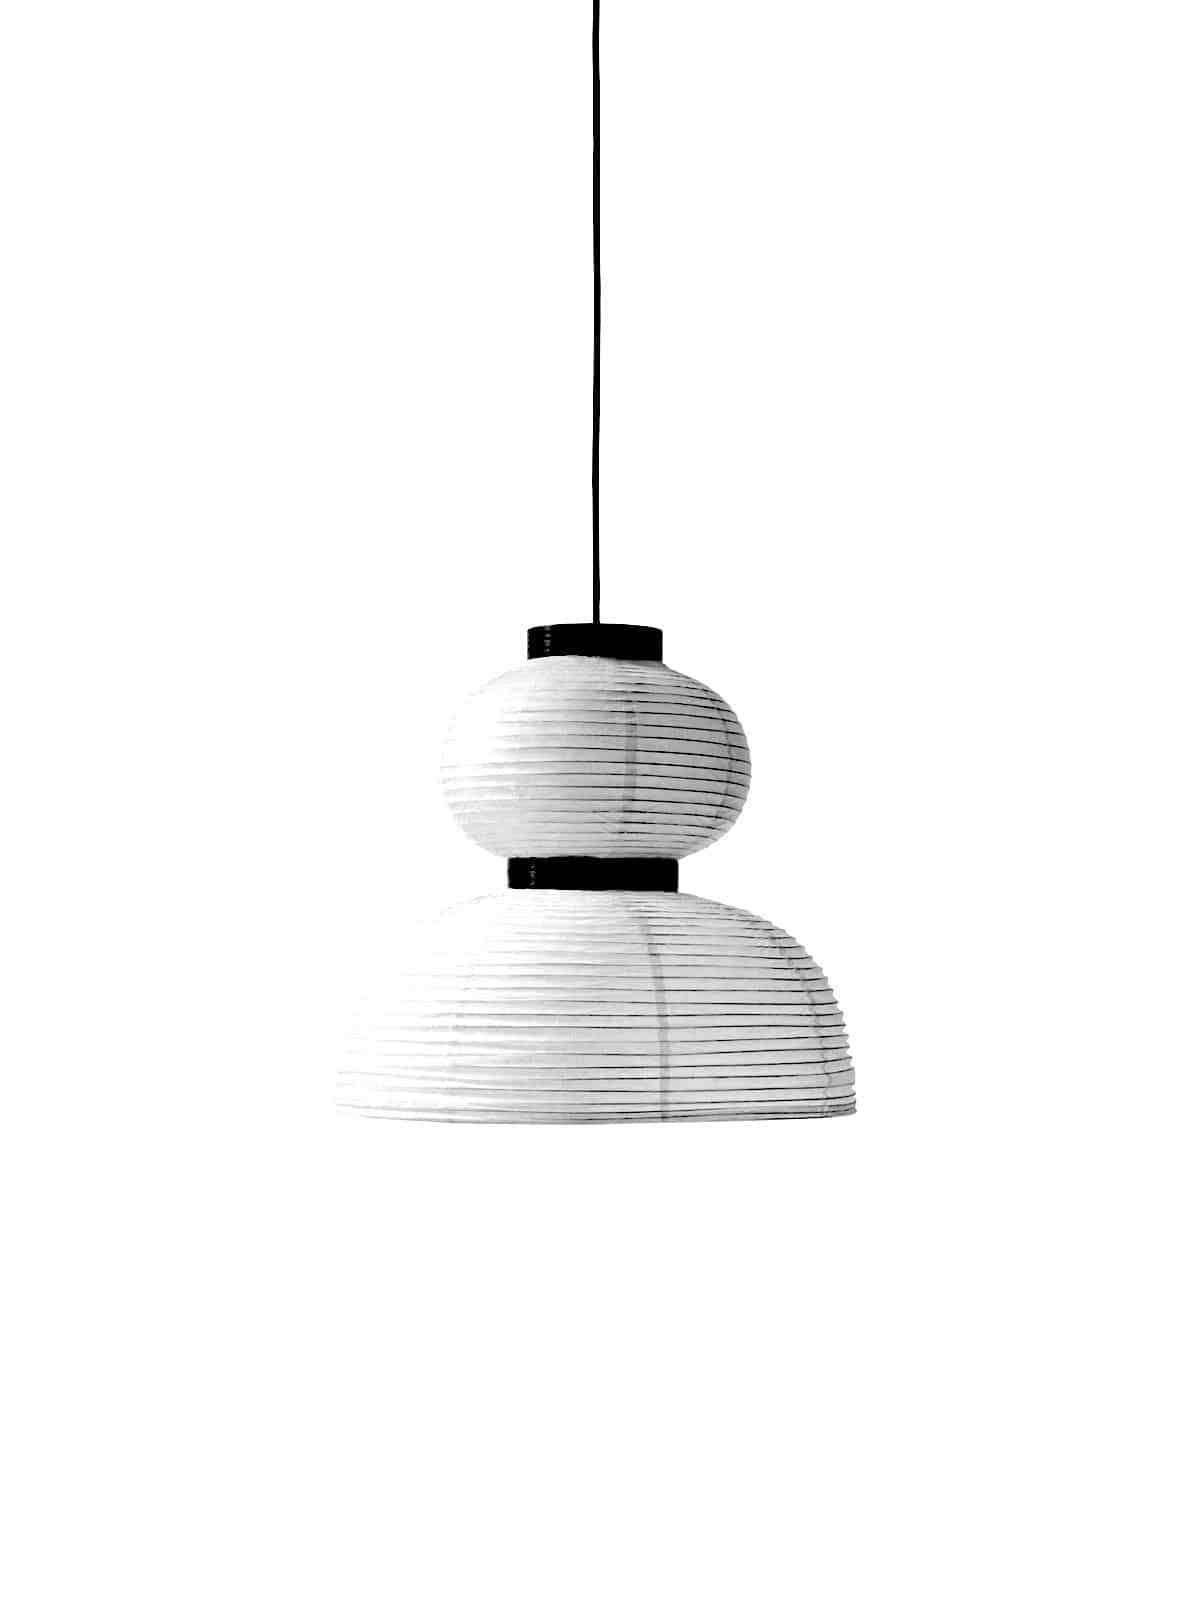 Formakami Jh4 Lampen Leuchten Designerleuchten Online Berlin Design Lampen Und Leuchten Lampen Berlin Design